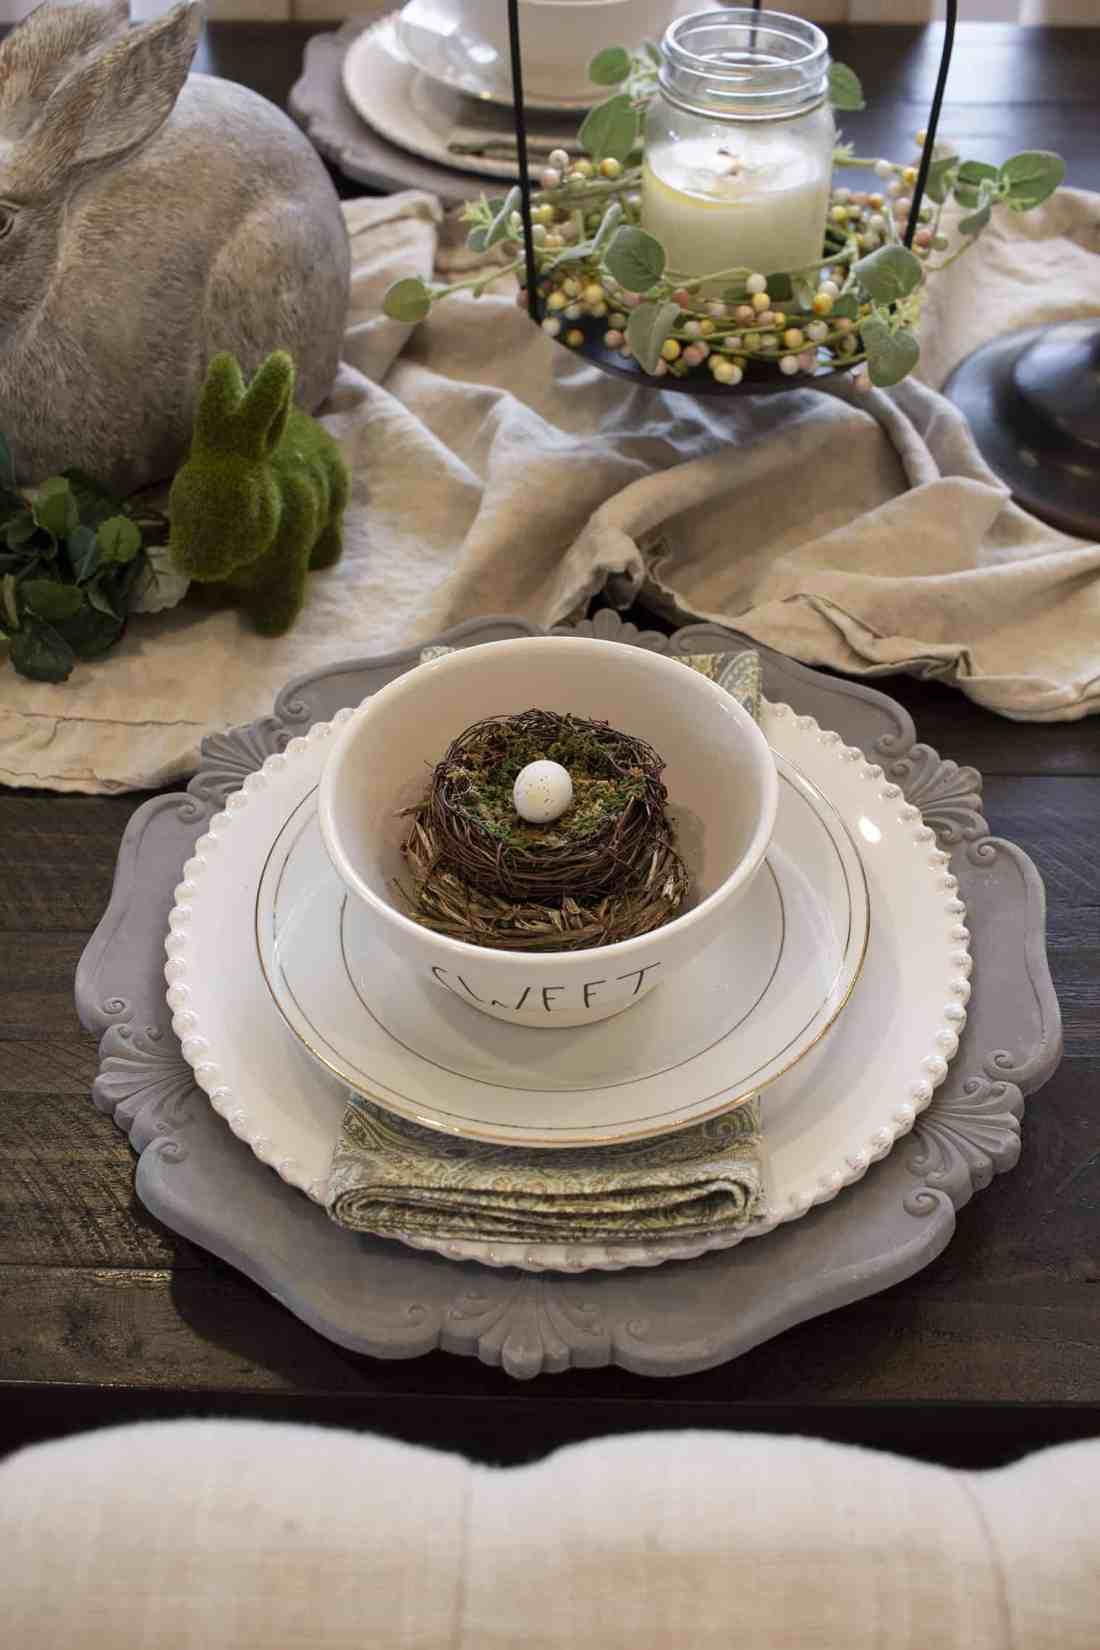 rae dunn bowls layered with china and stoneware